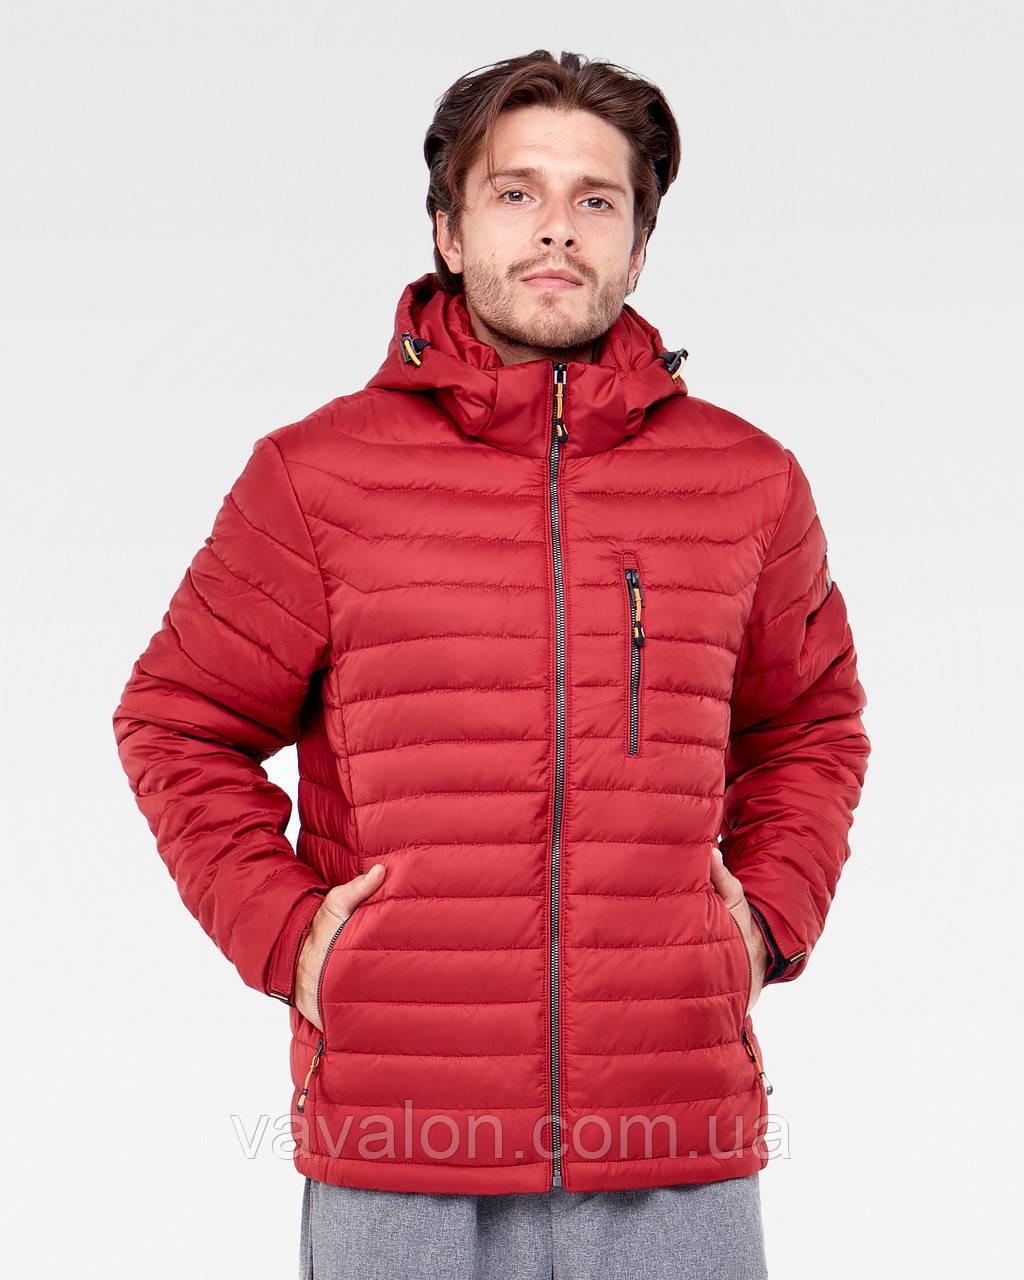 Куртка демисезонная Vavalon KD-908 Terracot